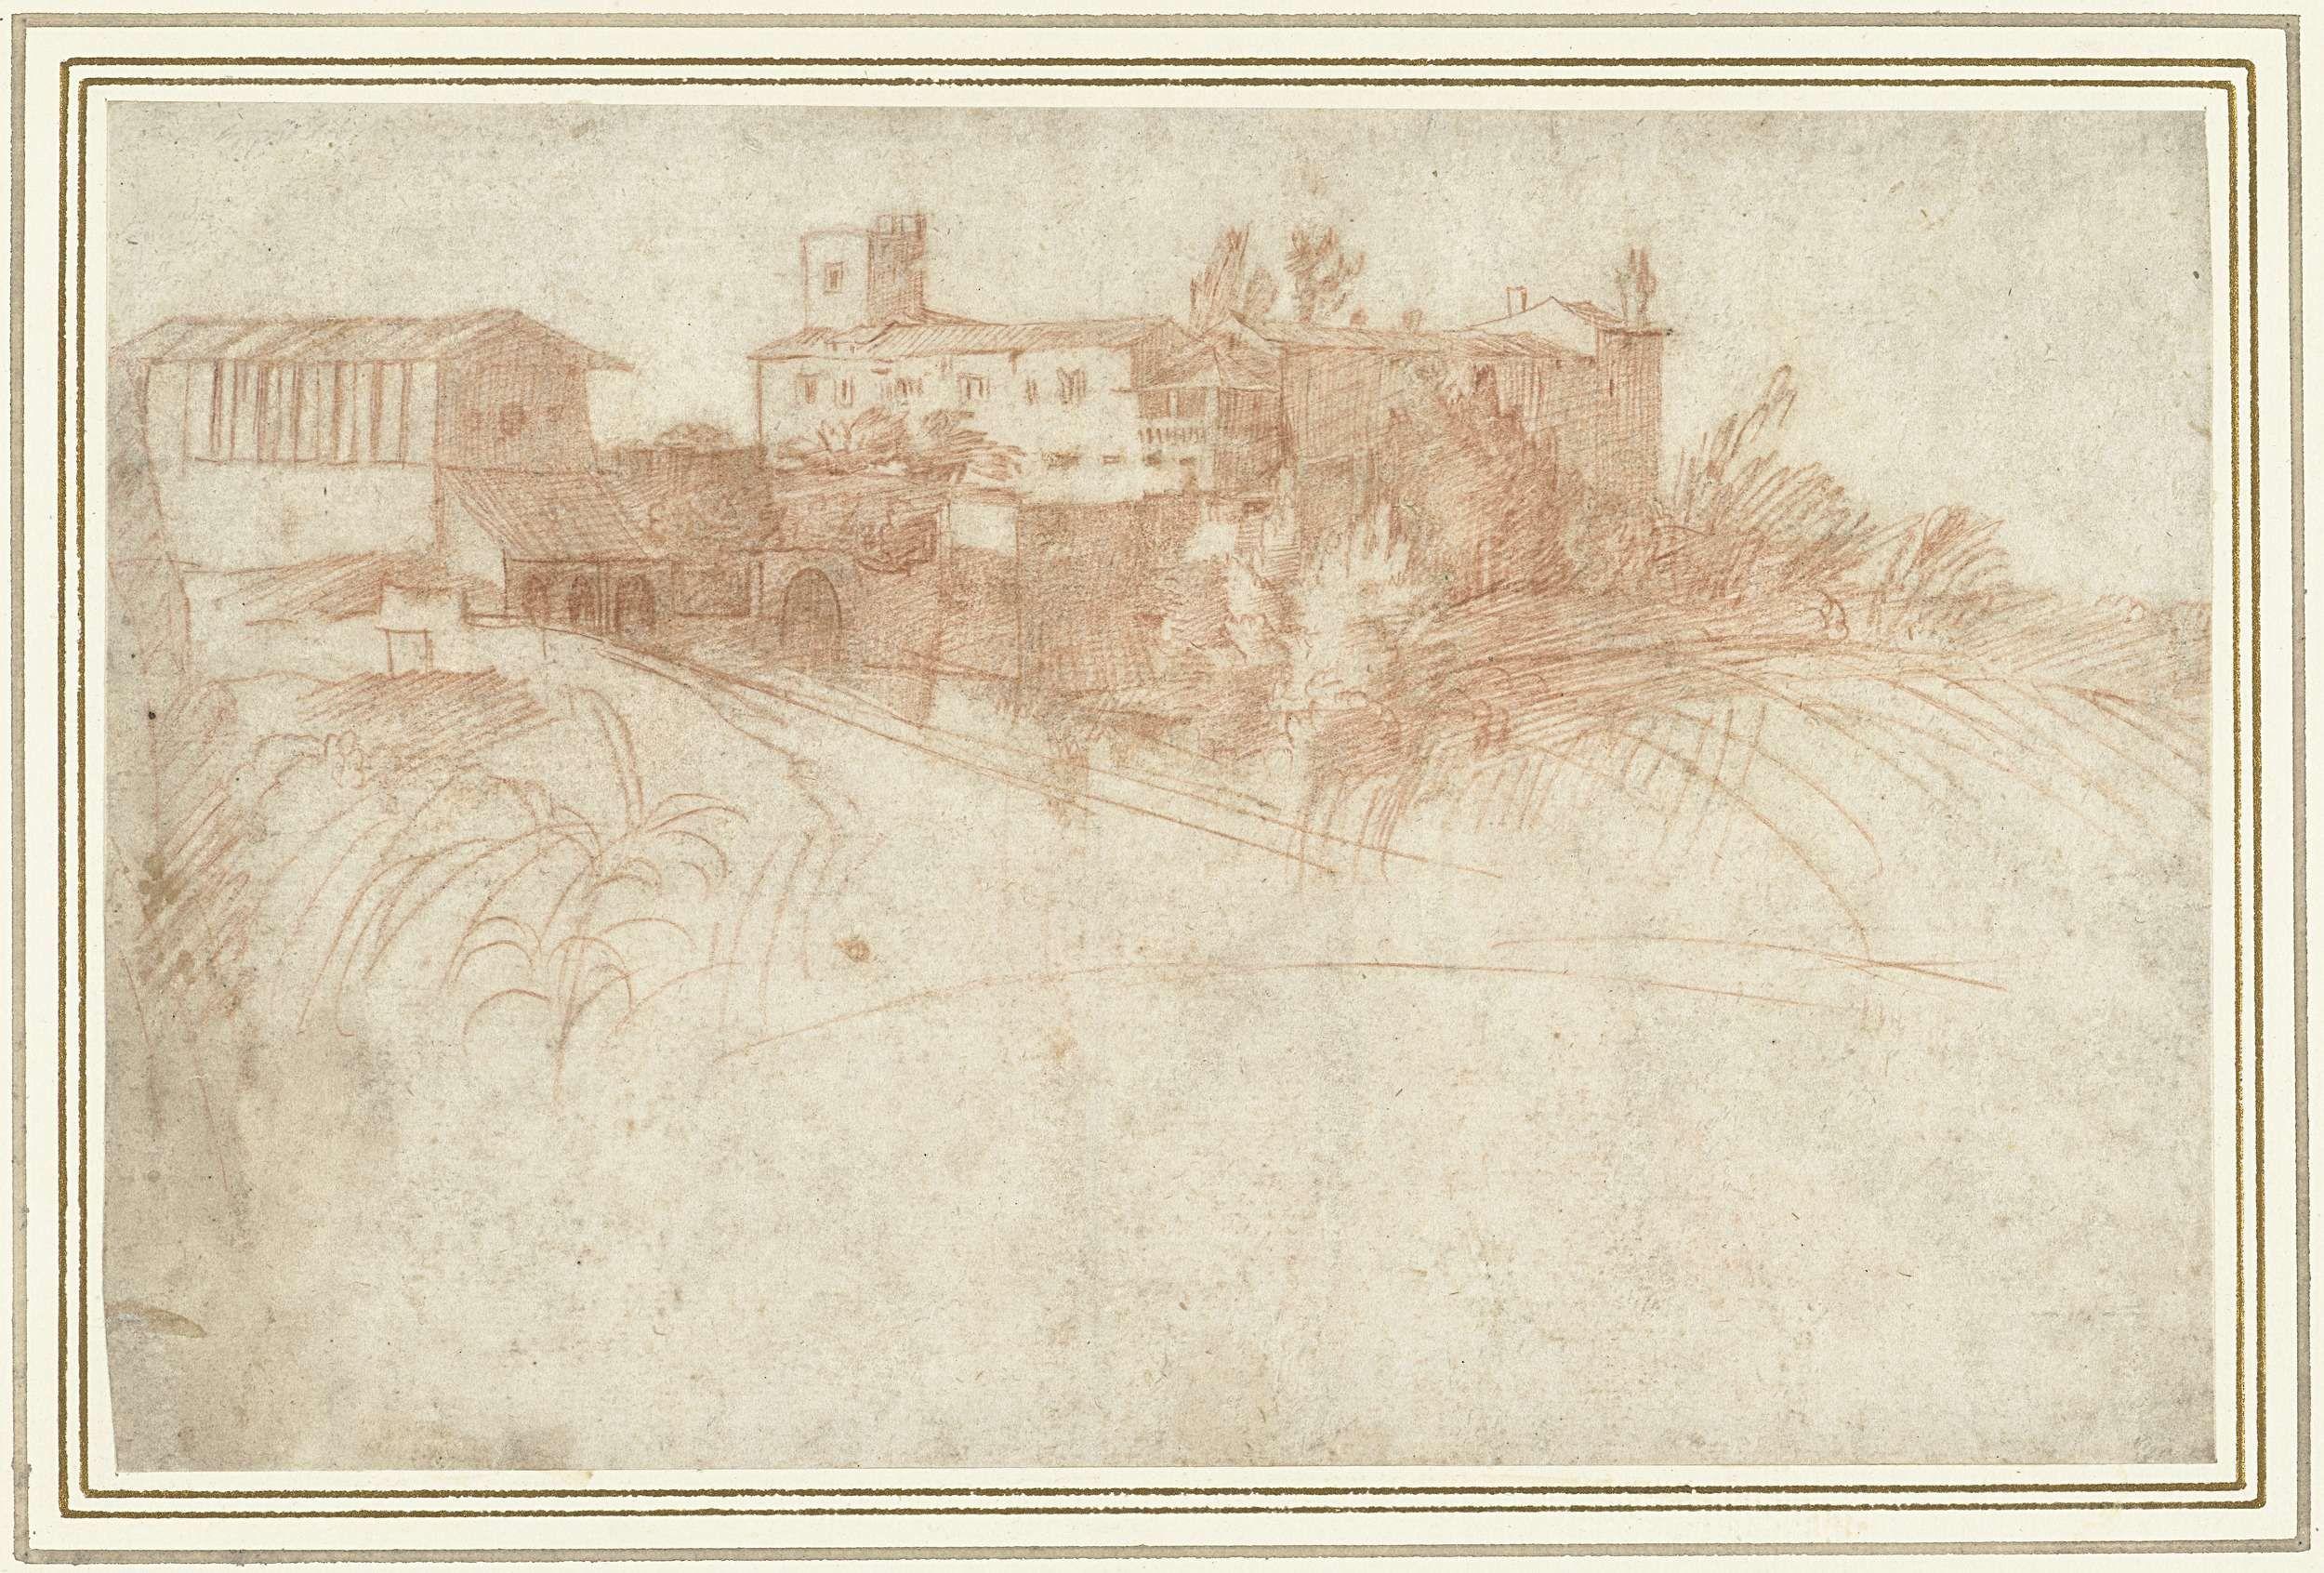 Michele Tosini | Kloostercomplex in de bergen, Michele Tosini, 1513 - 1577 |